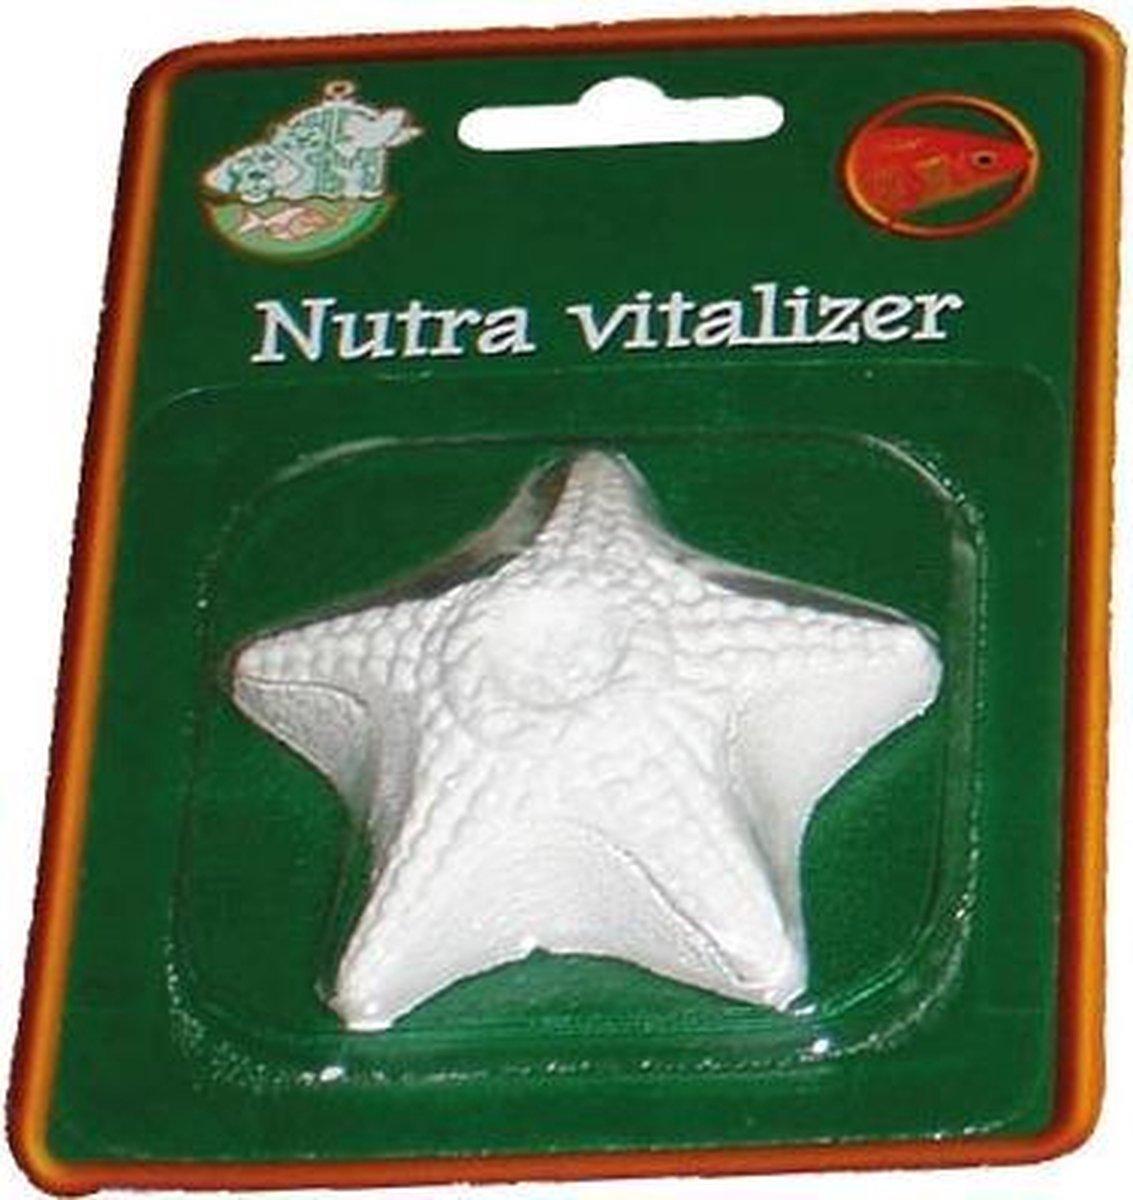 Nutra Vitalizer Zuurstofsteen - Aquarium Beluchting - 3 stuks - Merkloos